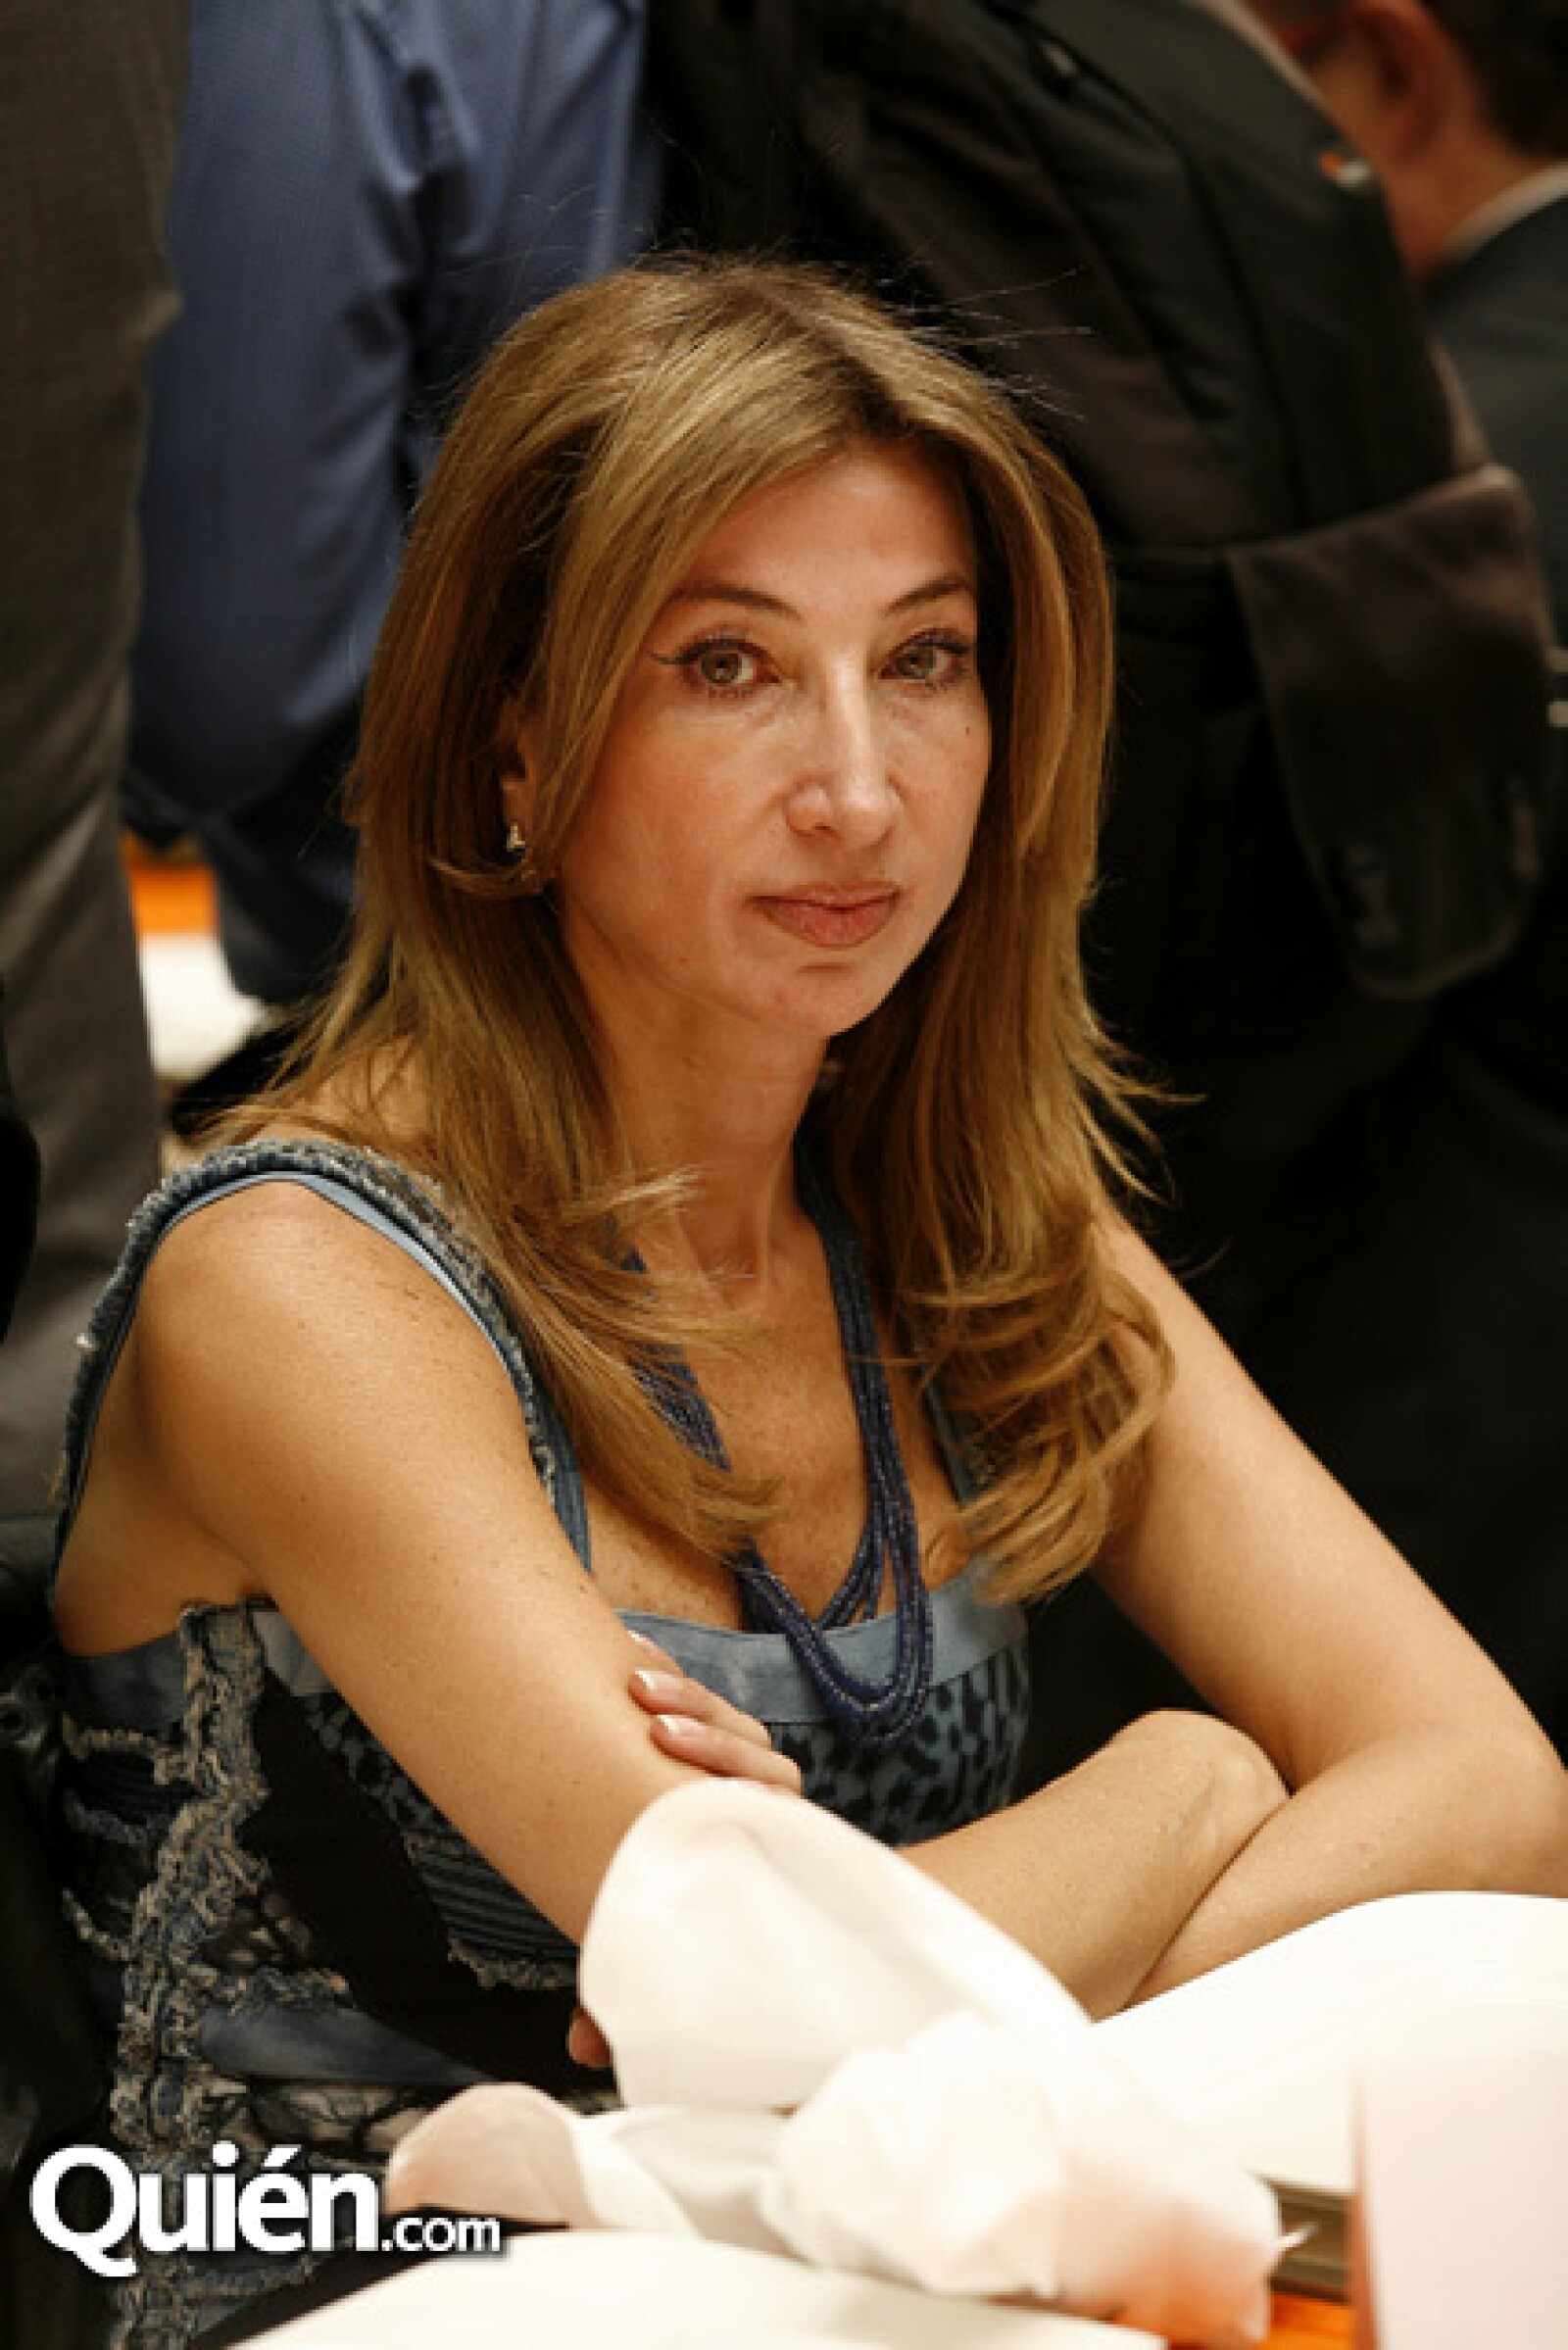 Lina Siman